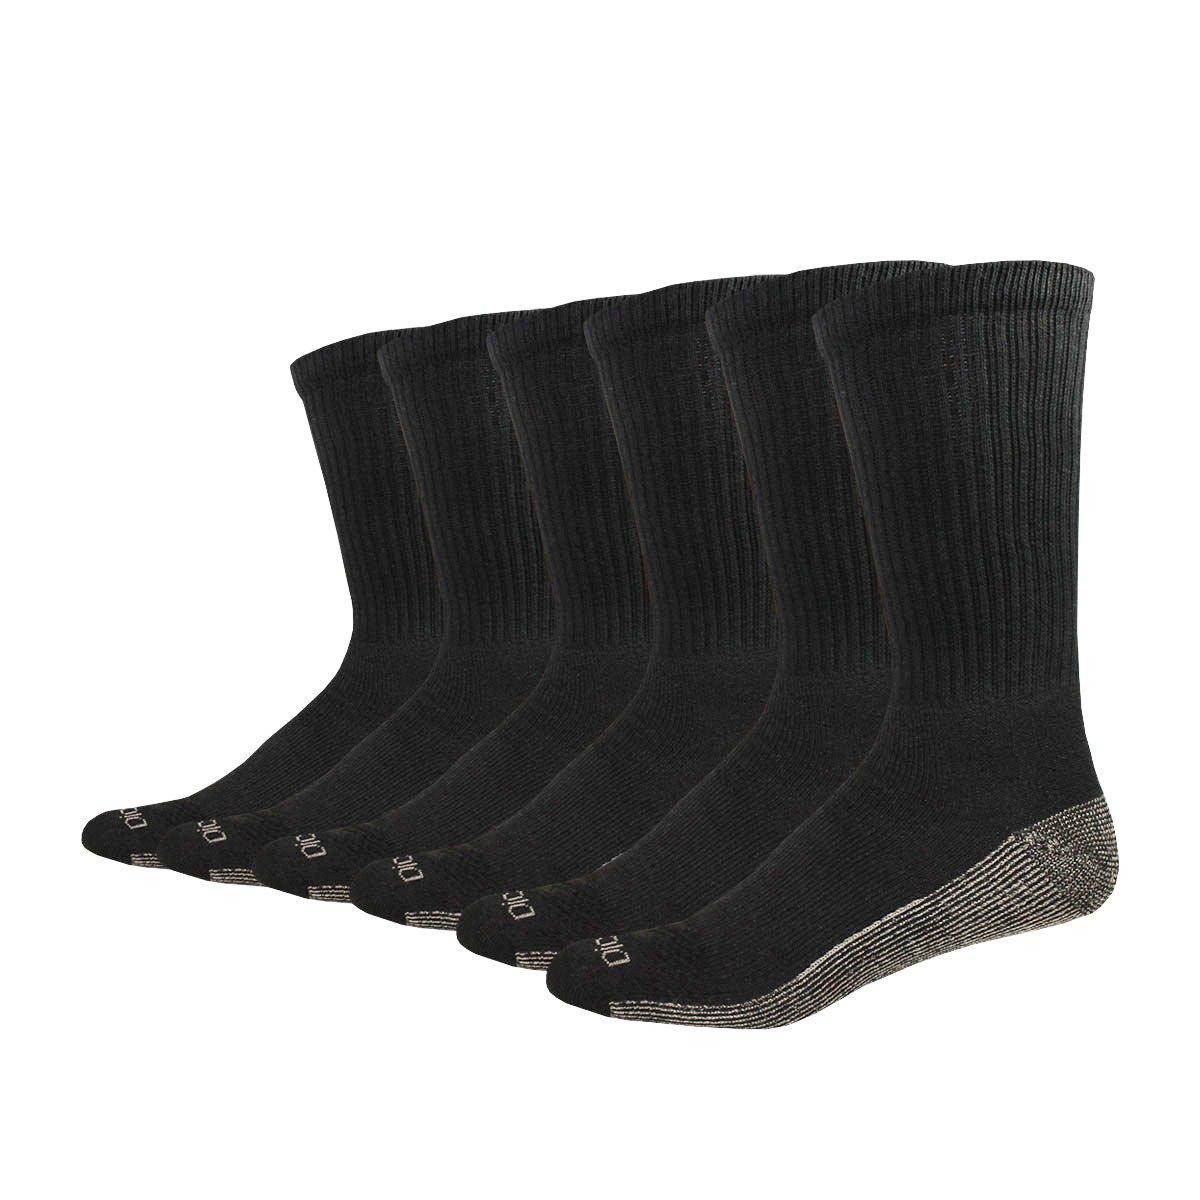 Dickies Men's Multi-Pack Dri-Tech Moisture Control Crew Socks, Black 6 Pack 6 Pack, Sock Size: 10-13/Shoe Size: 6-12 by Dickies